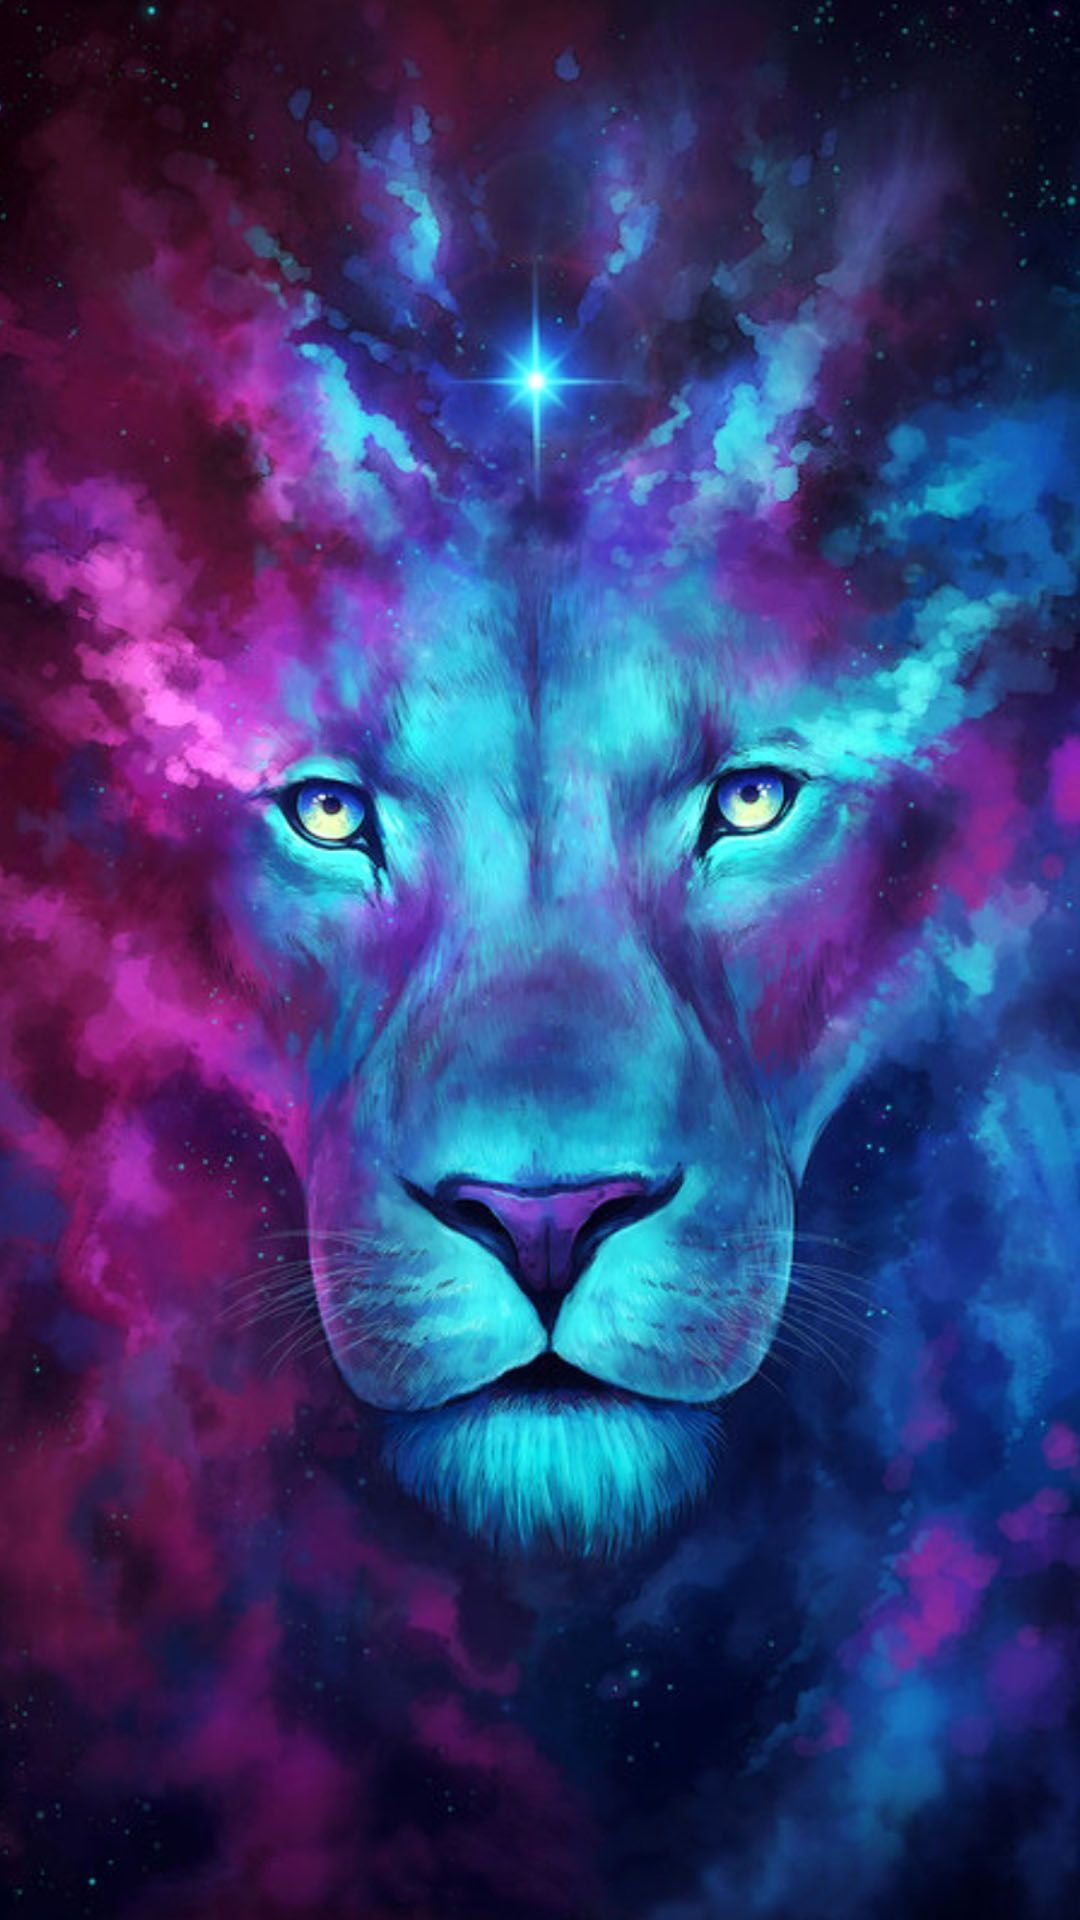 Galactic Lion Lion Painting Lion Wallpaper Wolf Wallpaper